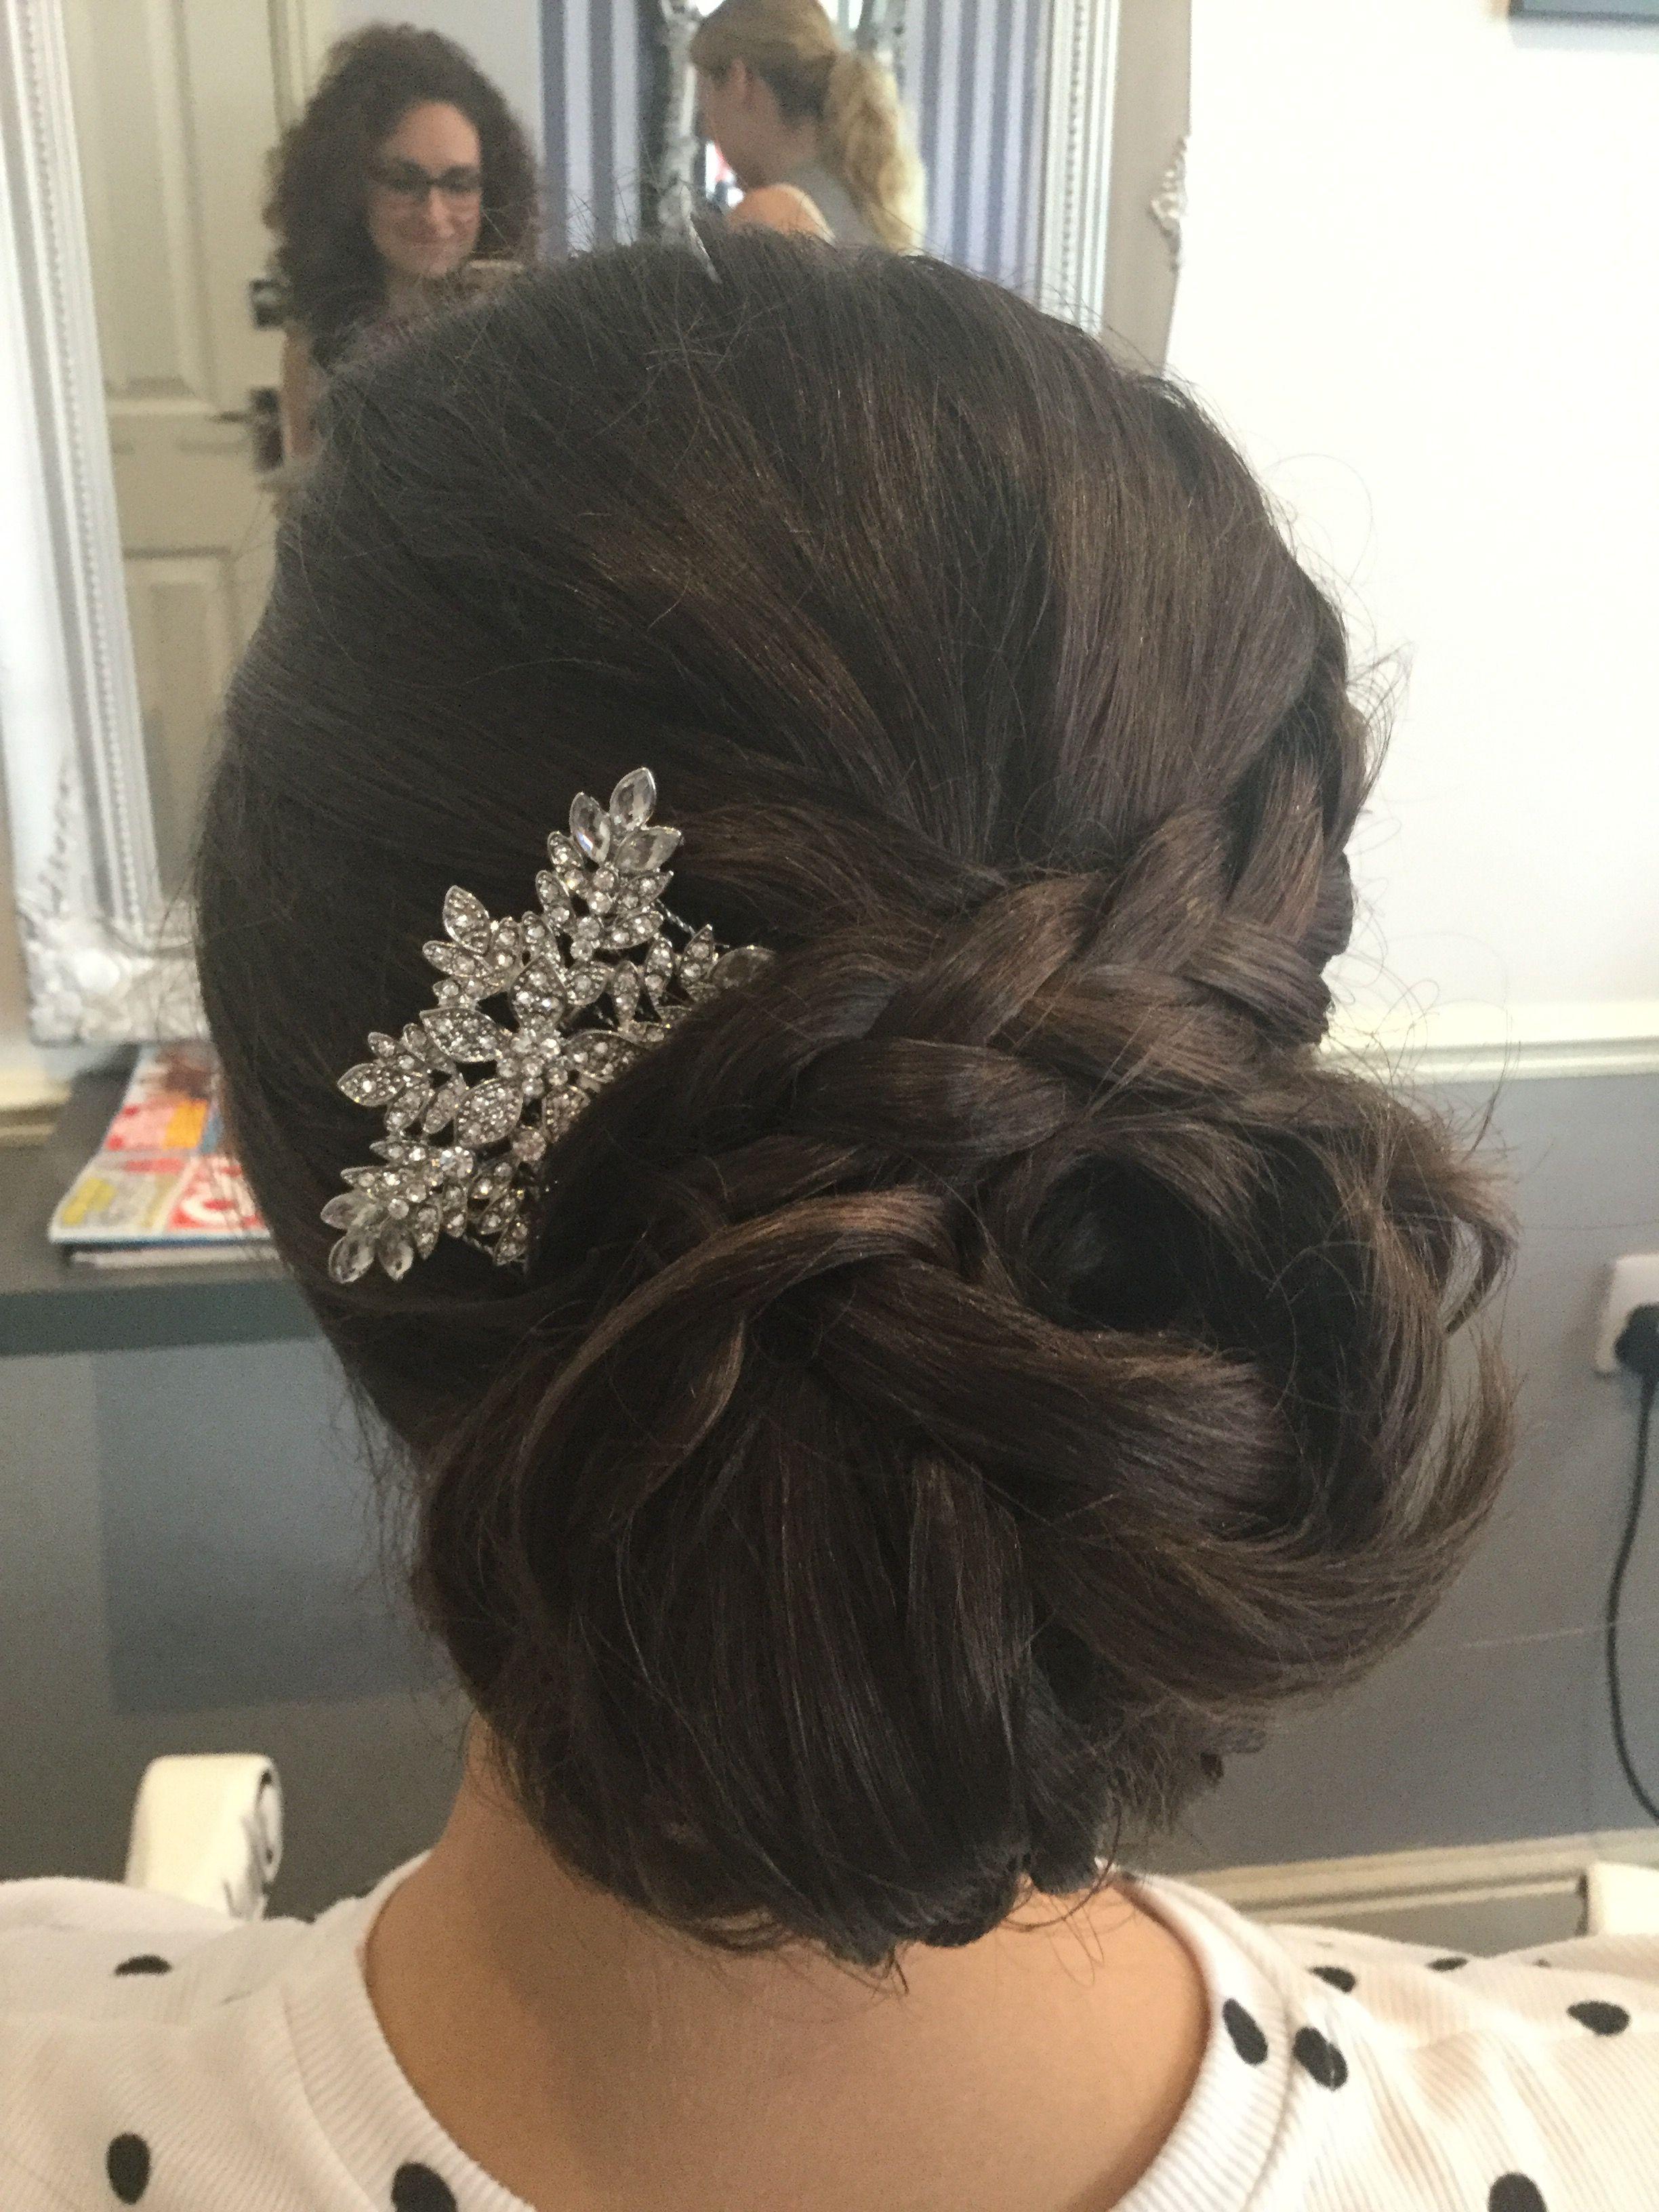 bridesmaid hair by lauren @ edgingtons worcester   hair